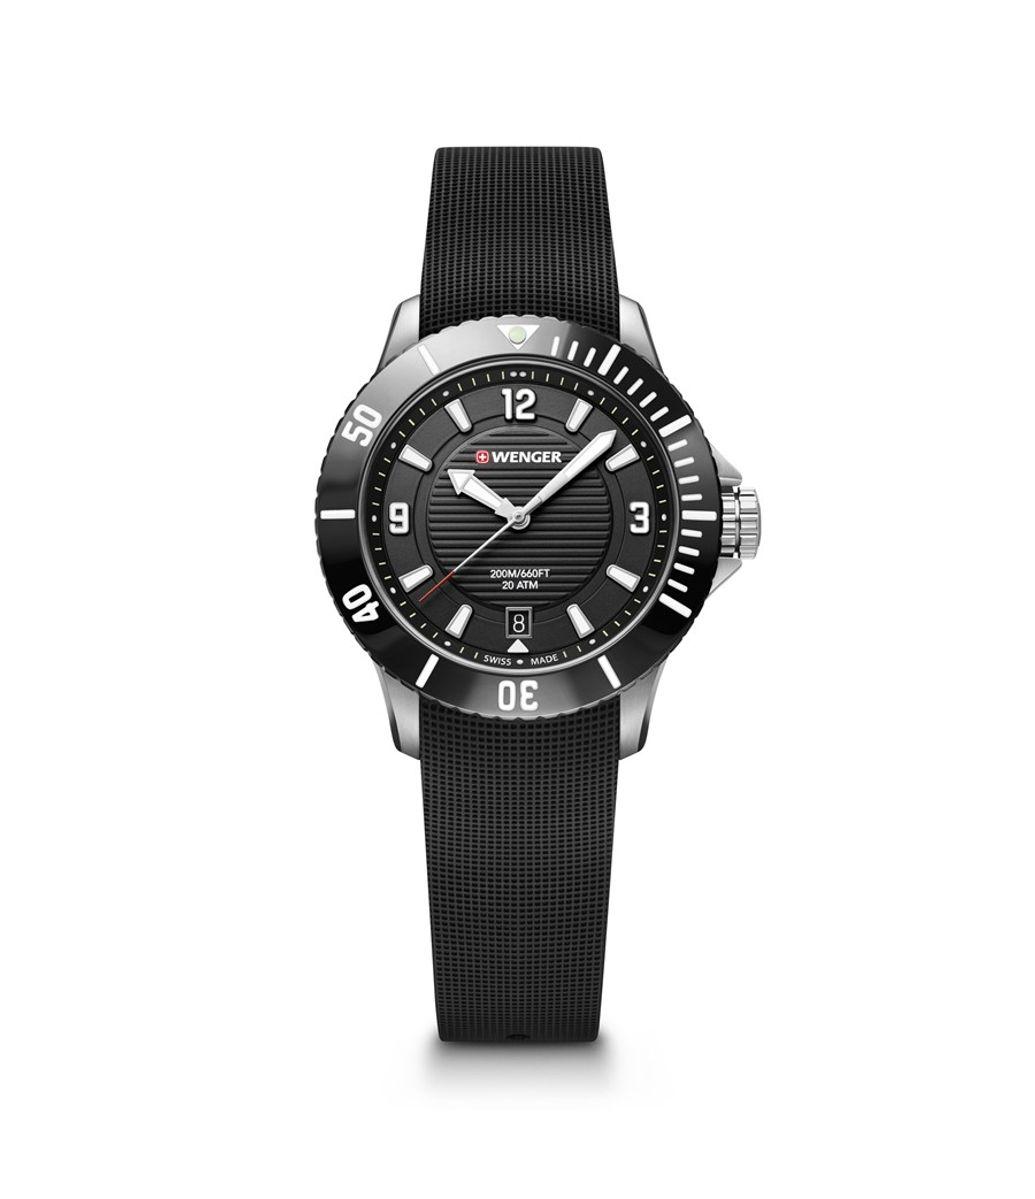 Relógio Masculino Wenger Seaforce Small